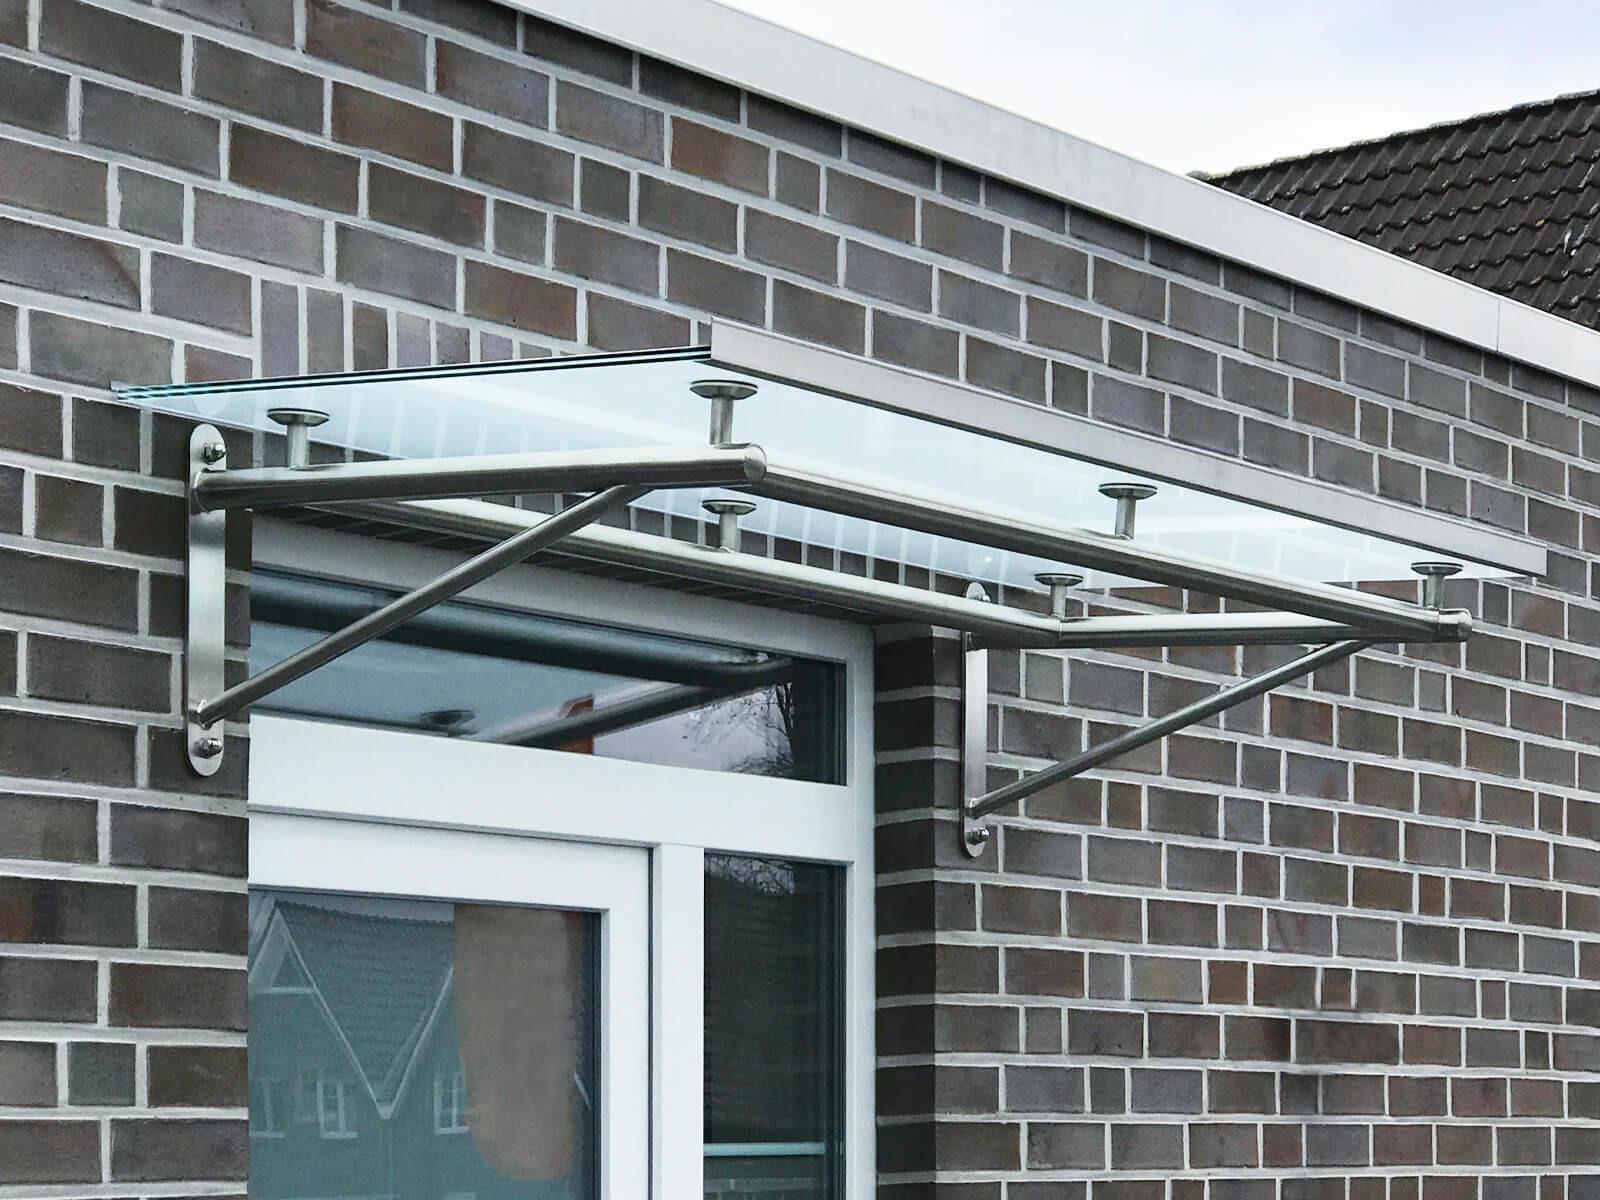 aluminium-regenrinne-an-vordach-trave